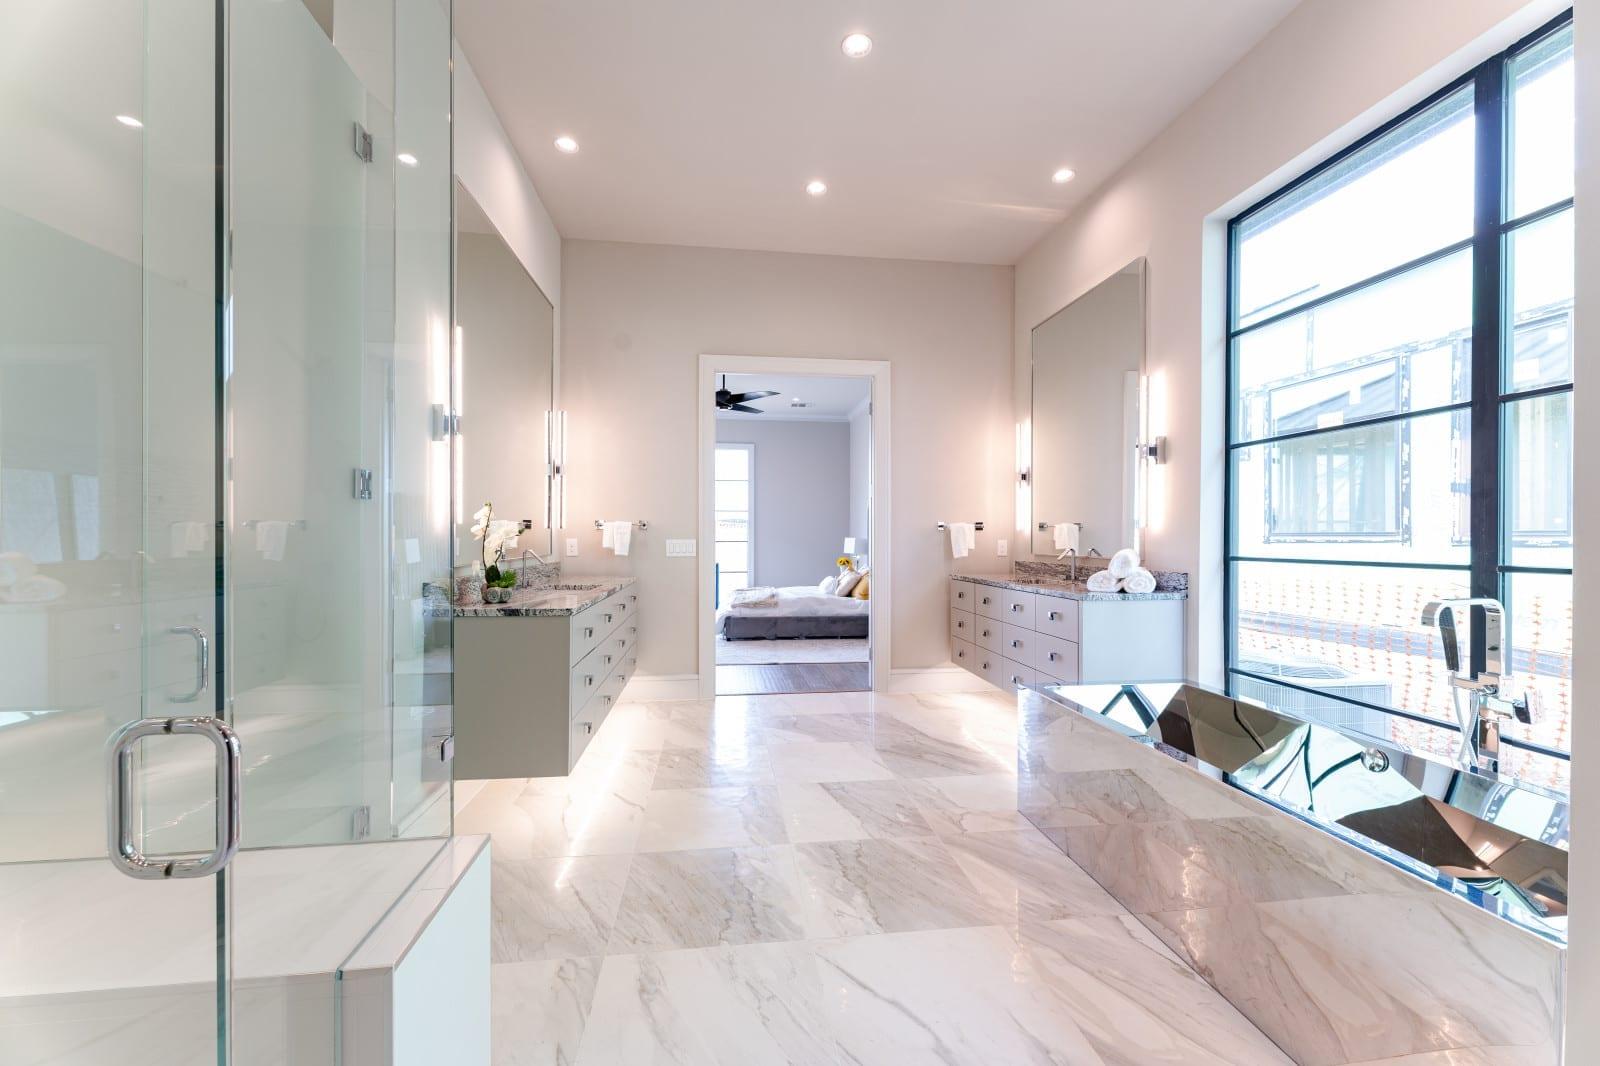 Modern Style Homes design # 23 - Millennial Design + Build